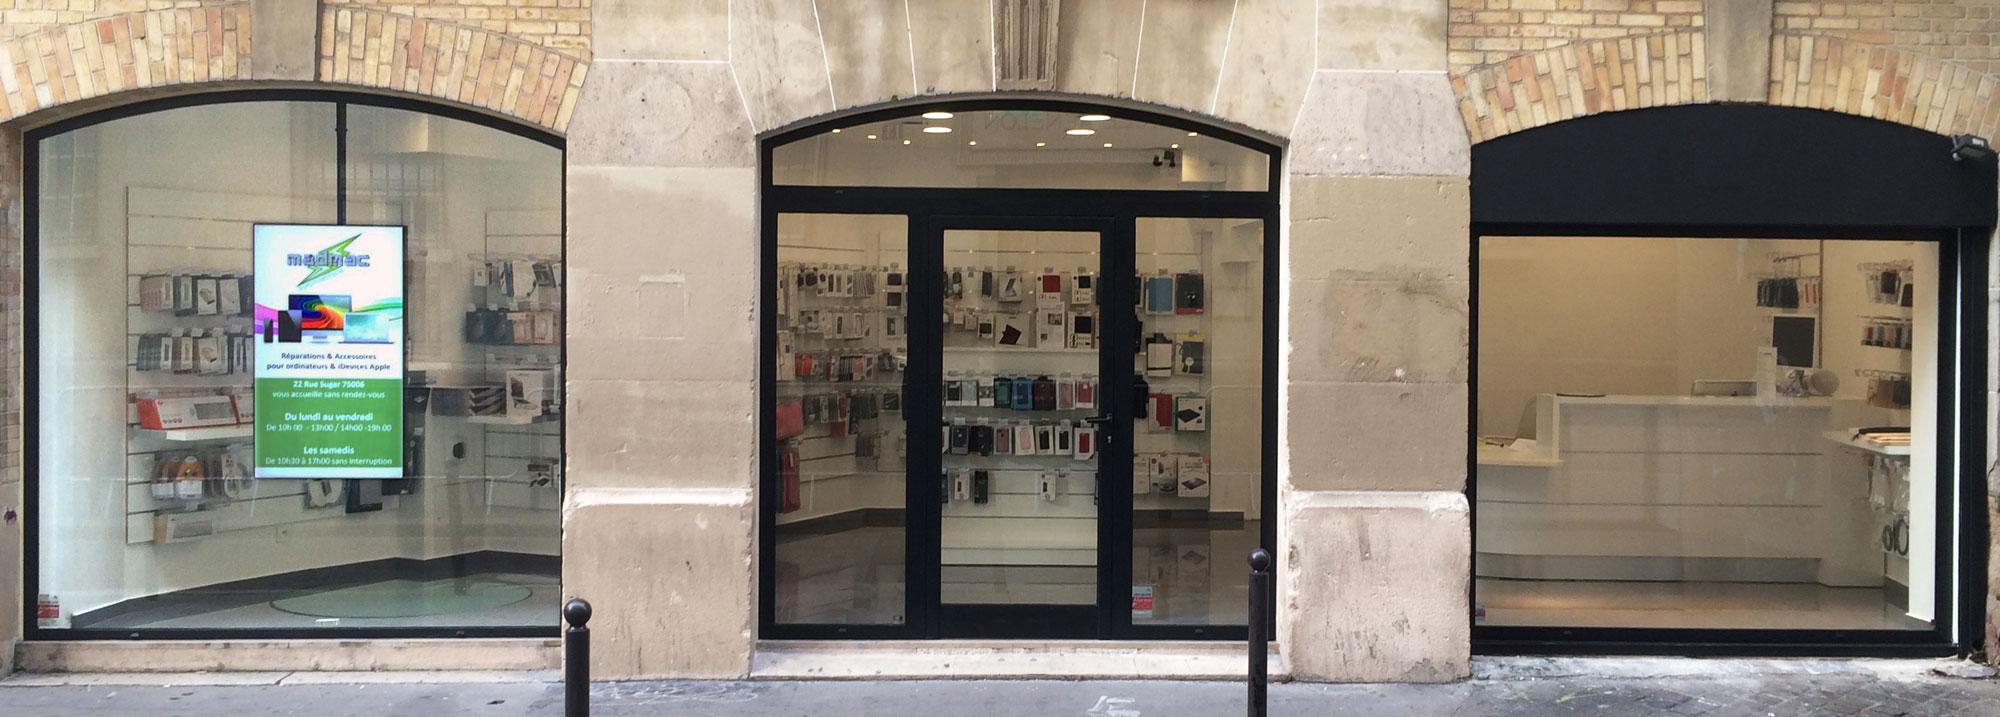 madmac-rue-75006-2000px